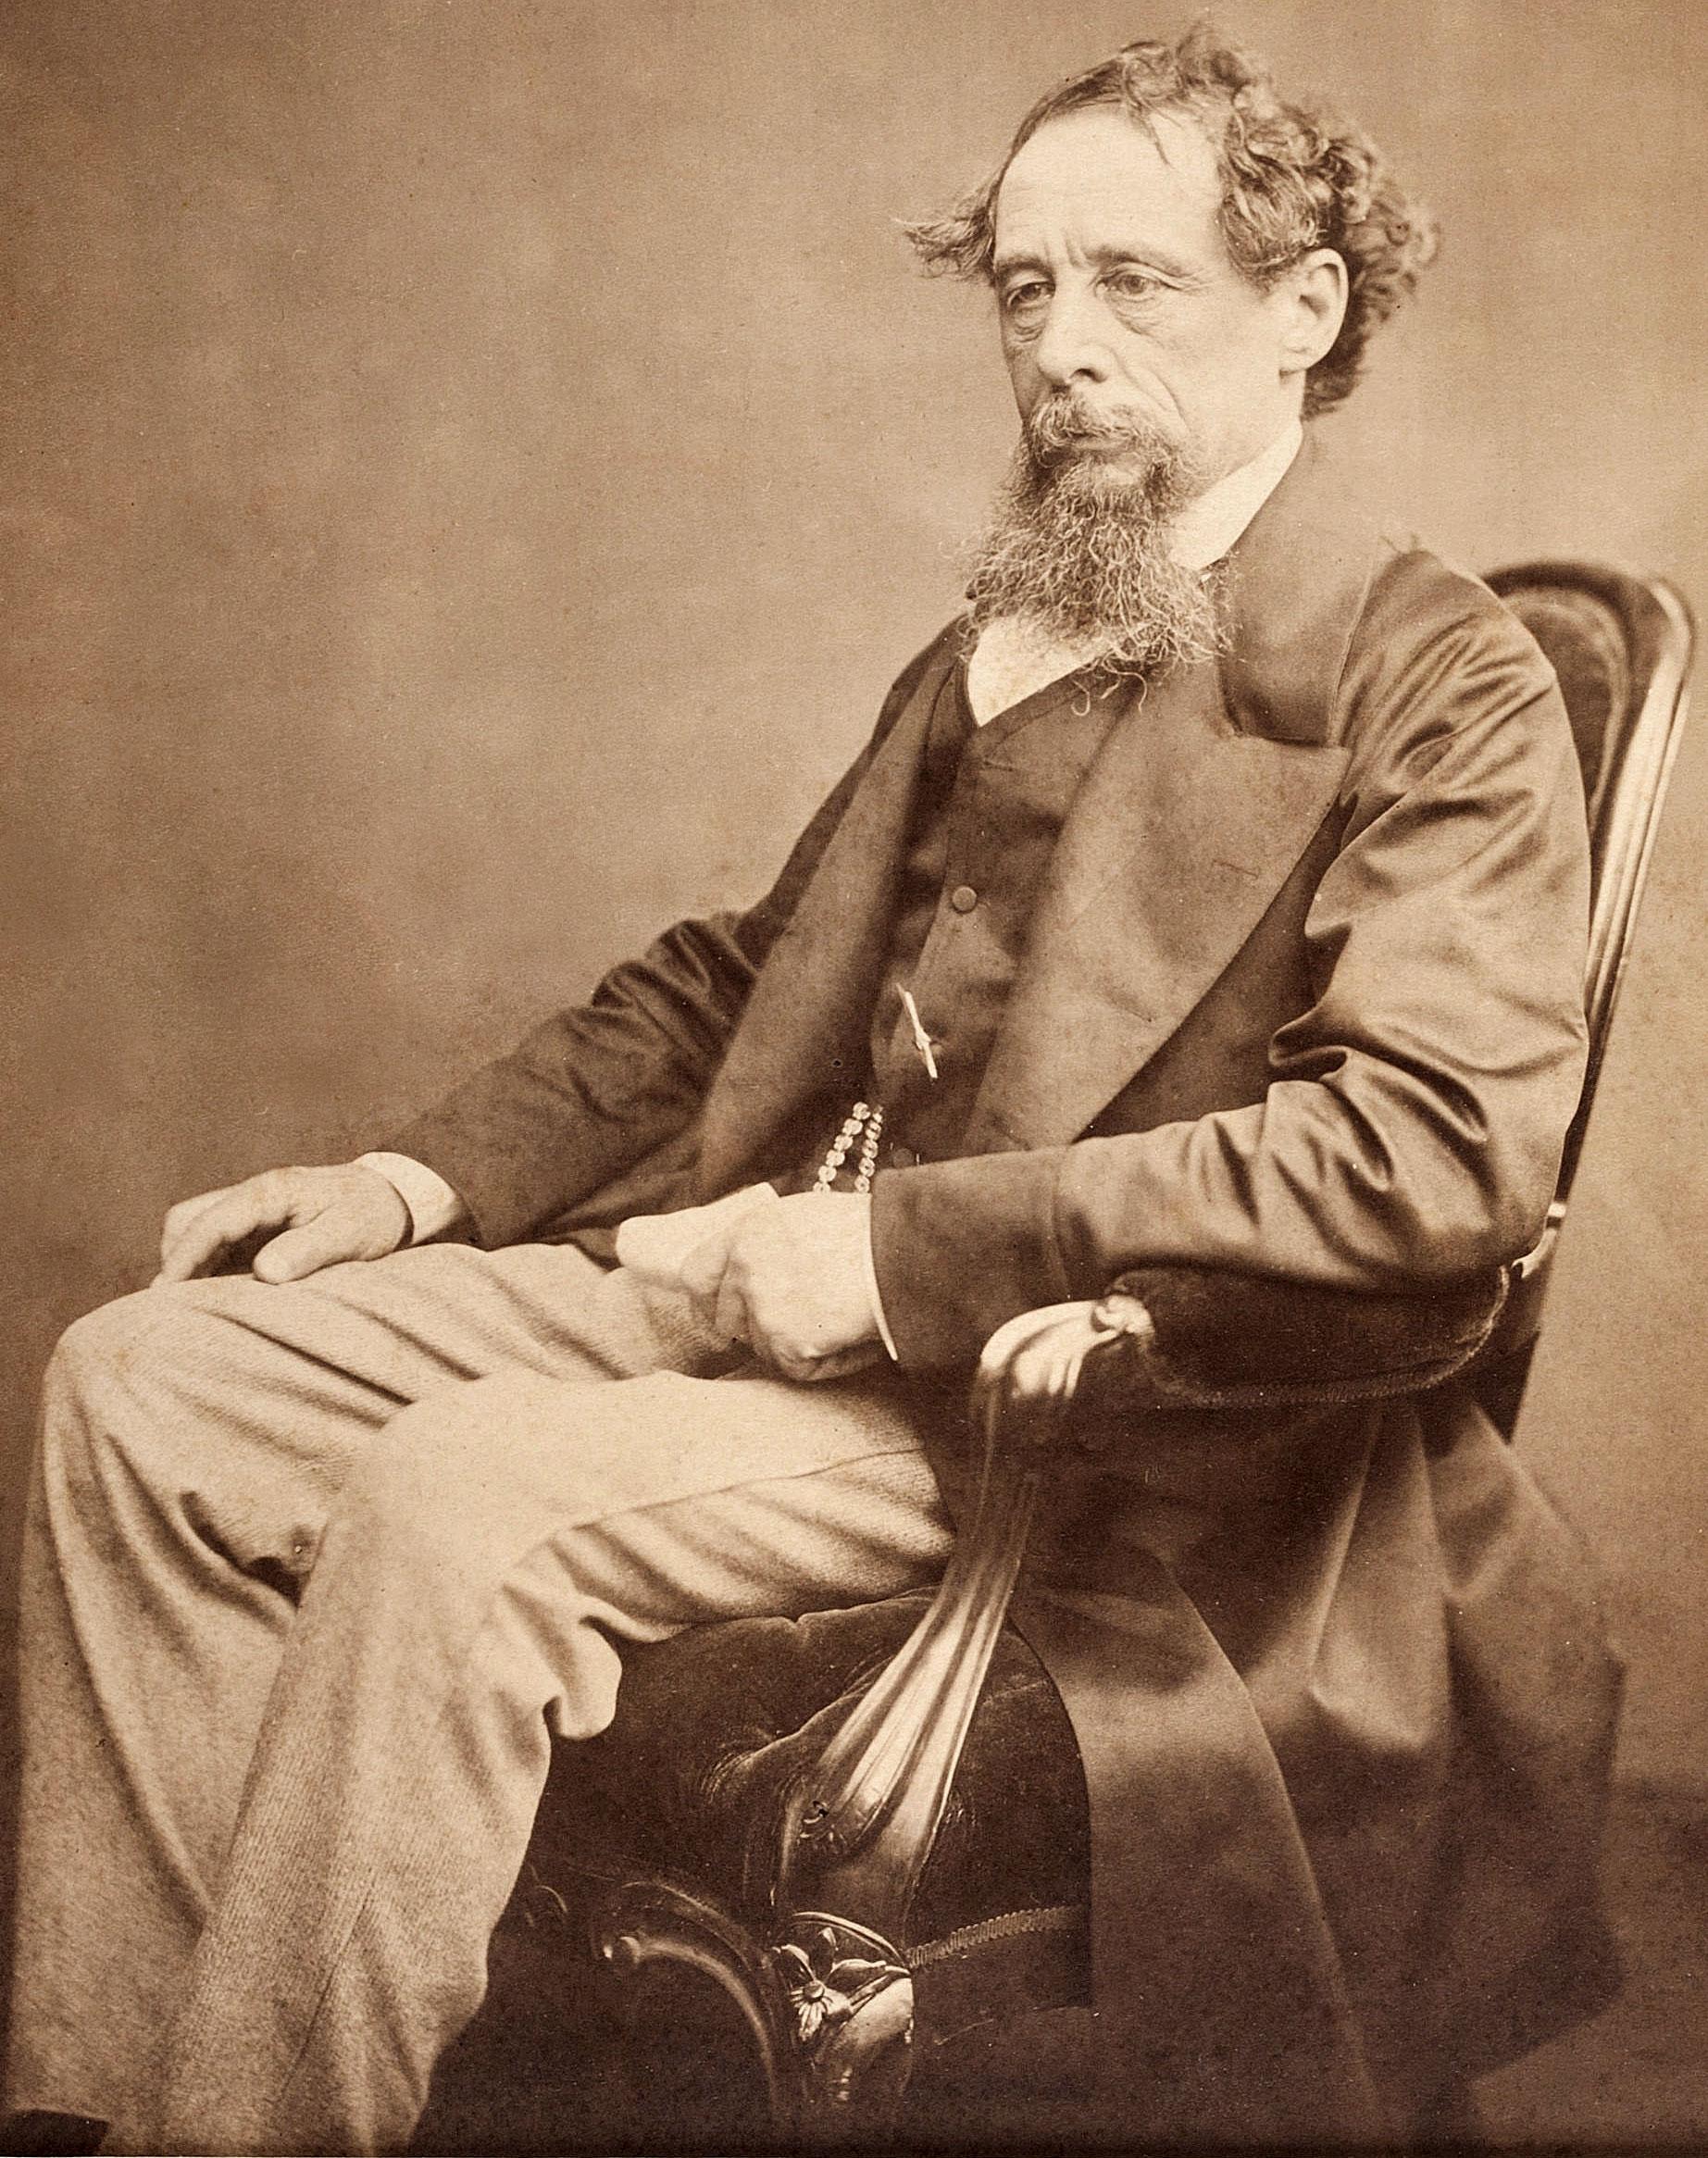 Чарльз Диккенс, примерно 1860 год